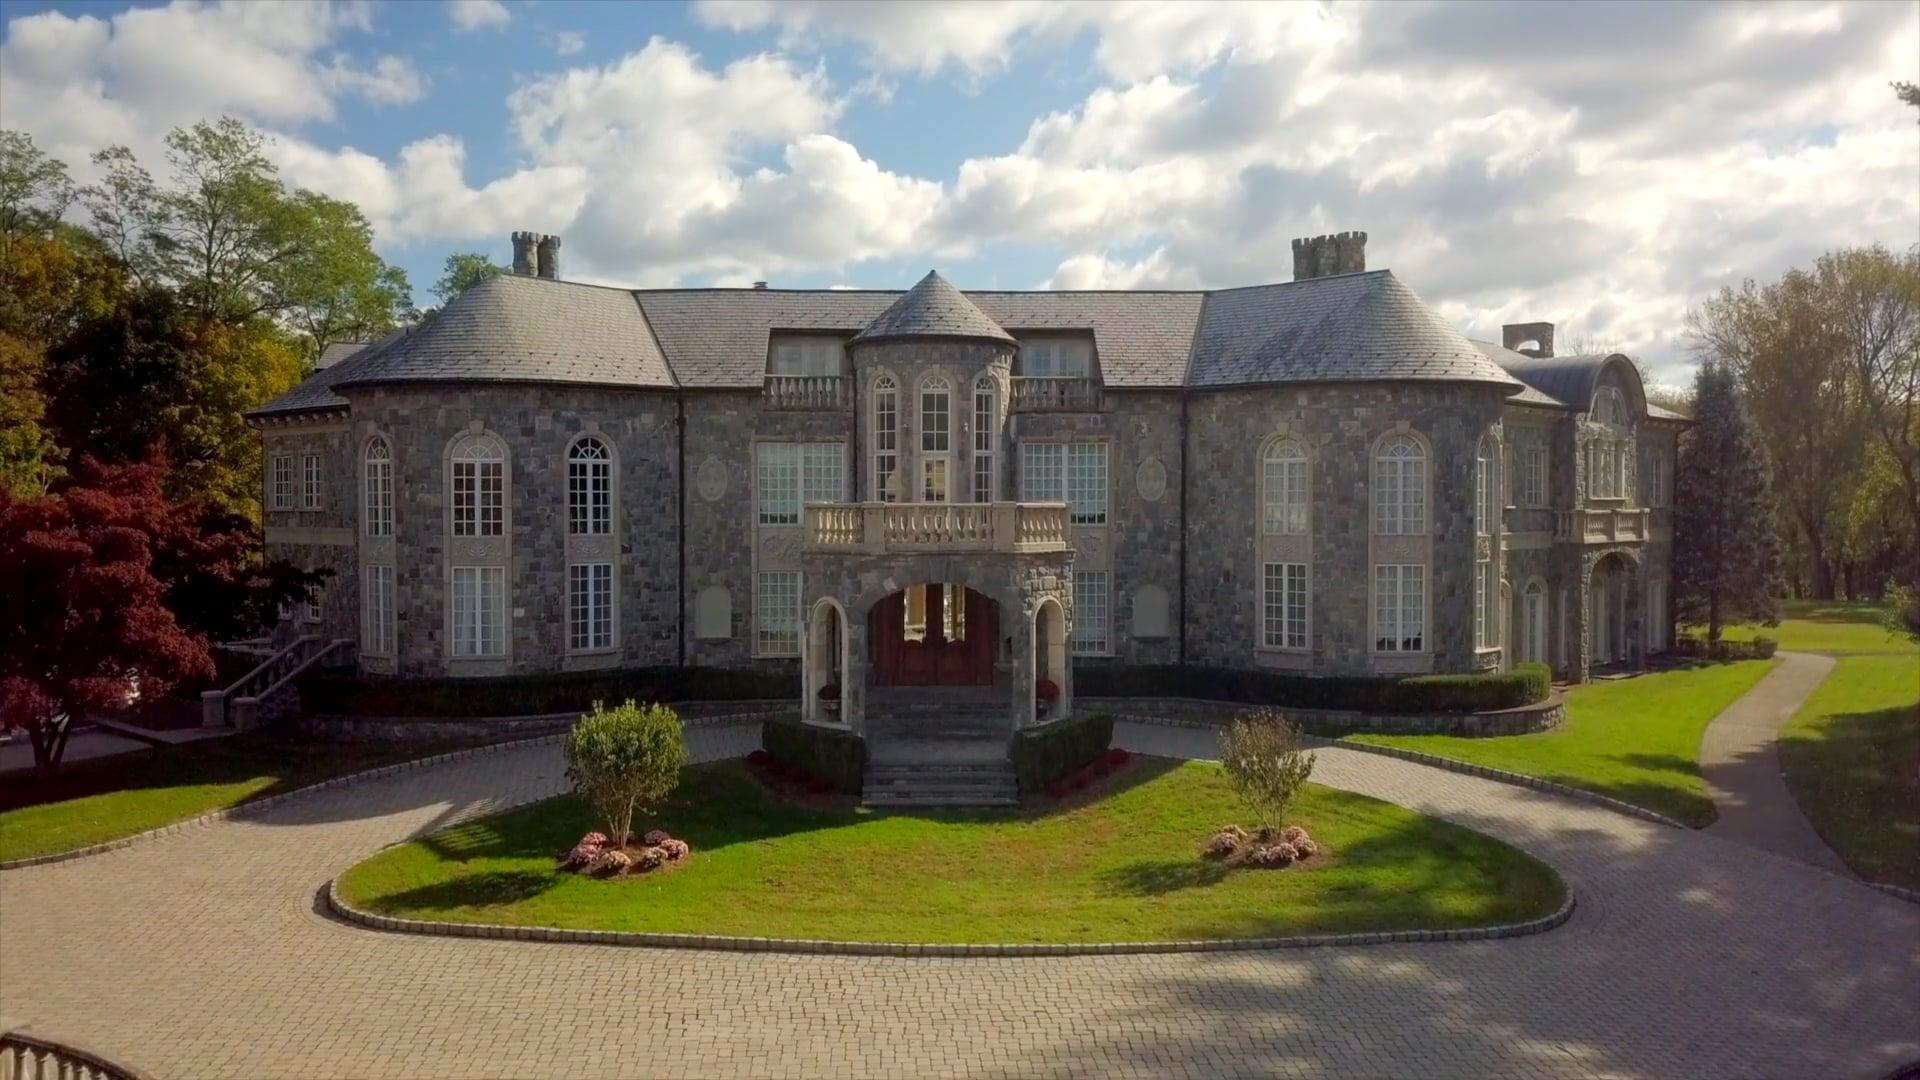 Stone Palace on the Hill, Saddle River, NJ